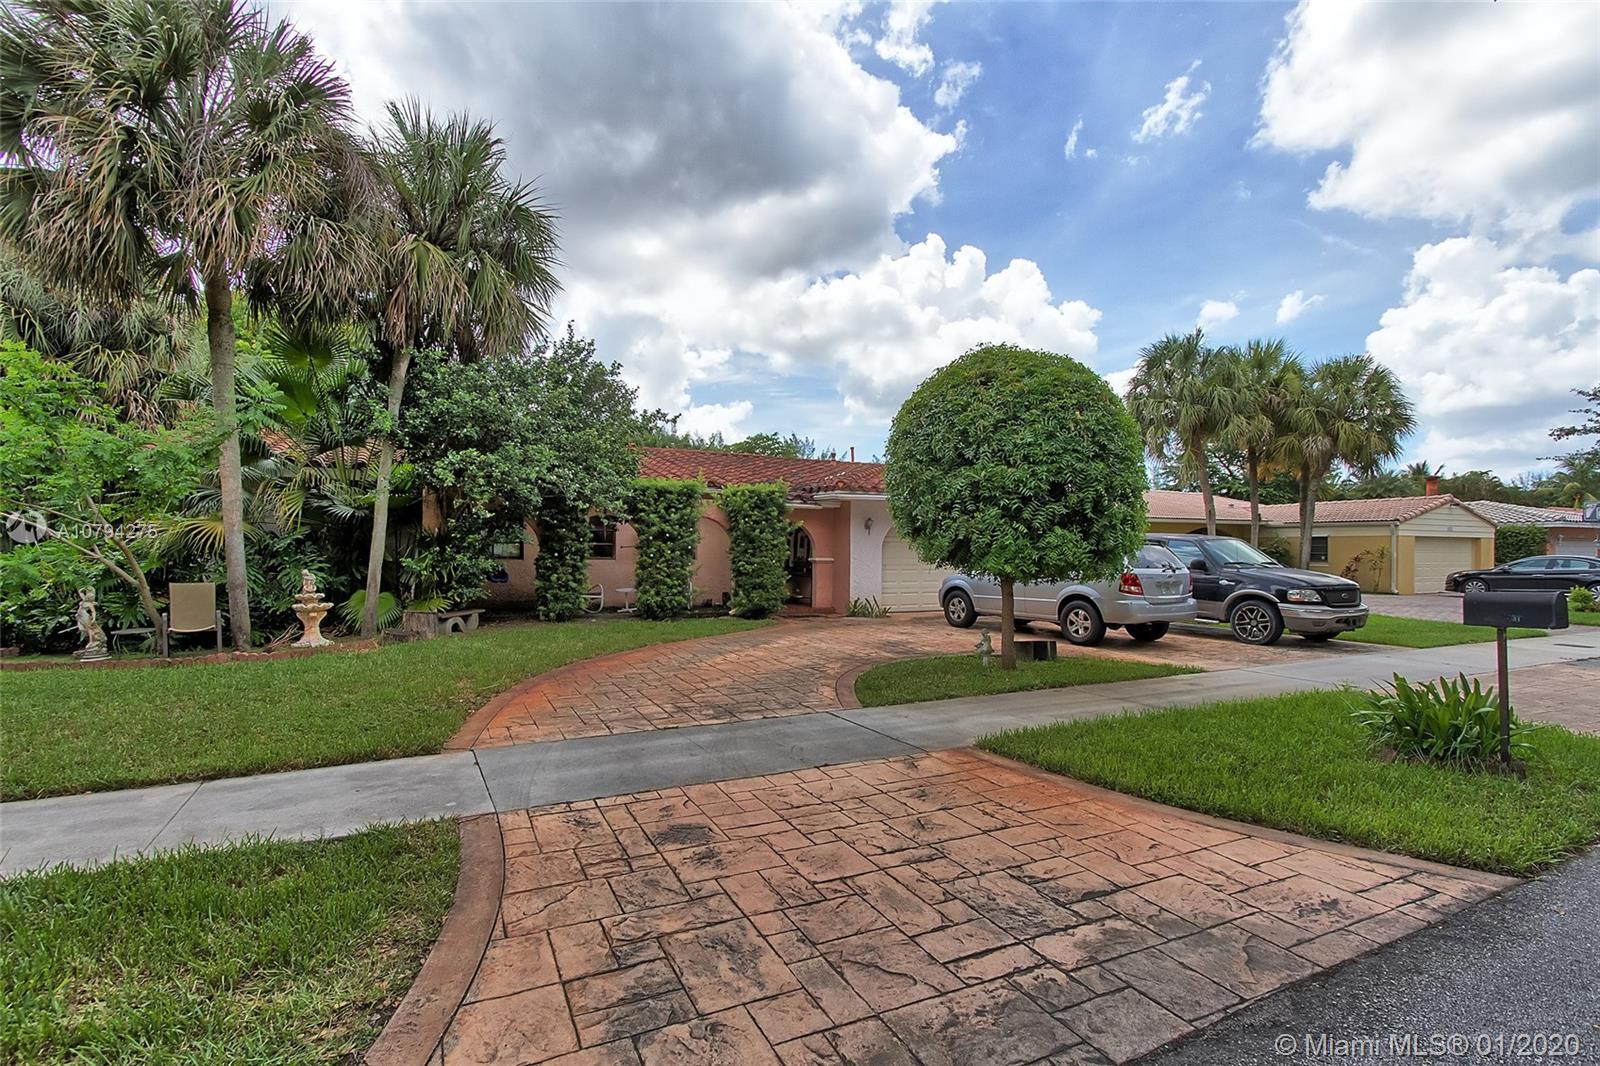 15331 Turnbull Dr, Miami Lakes, FL 33014